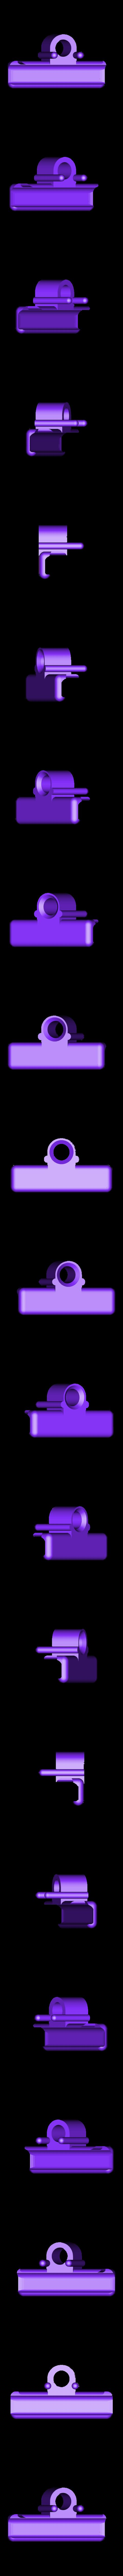 ZBKartWheel_clip_ver01.stl Download free STL file ZB KartWheel - Nintendo Switch Steering Wheel • 3D printing design, Zippityboomba